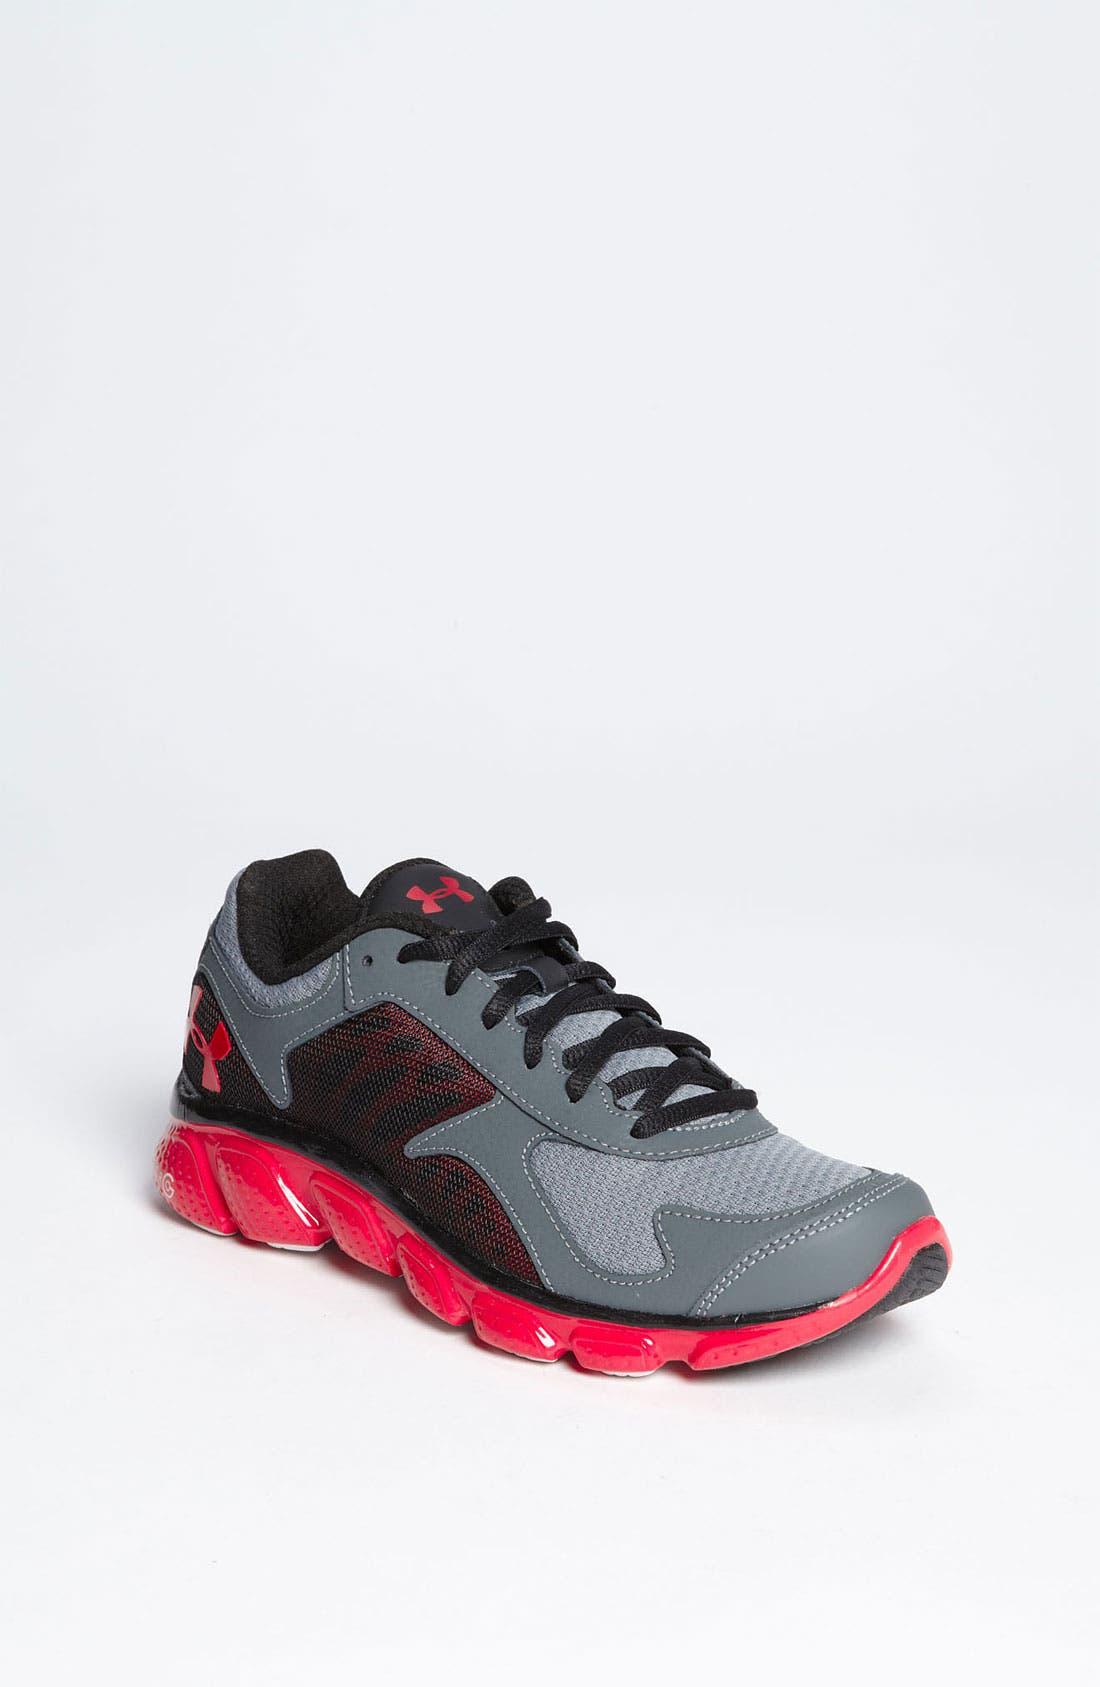 Alternate Image 1 Selected - Under Armour 'Micro G® Skulpt' Sneaker (Toddler, Little Kid & Big Kid)